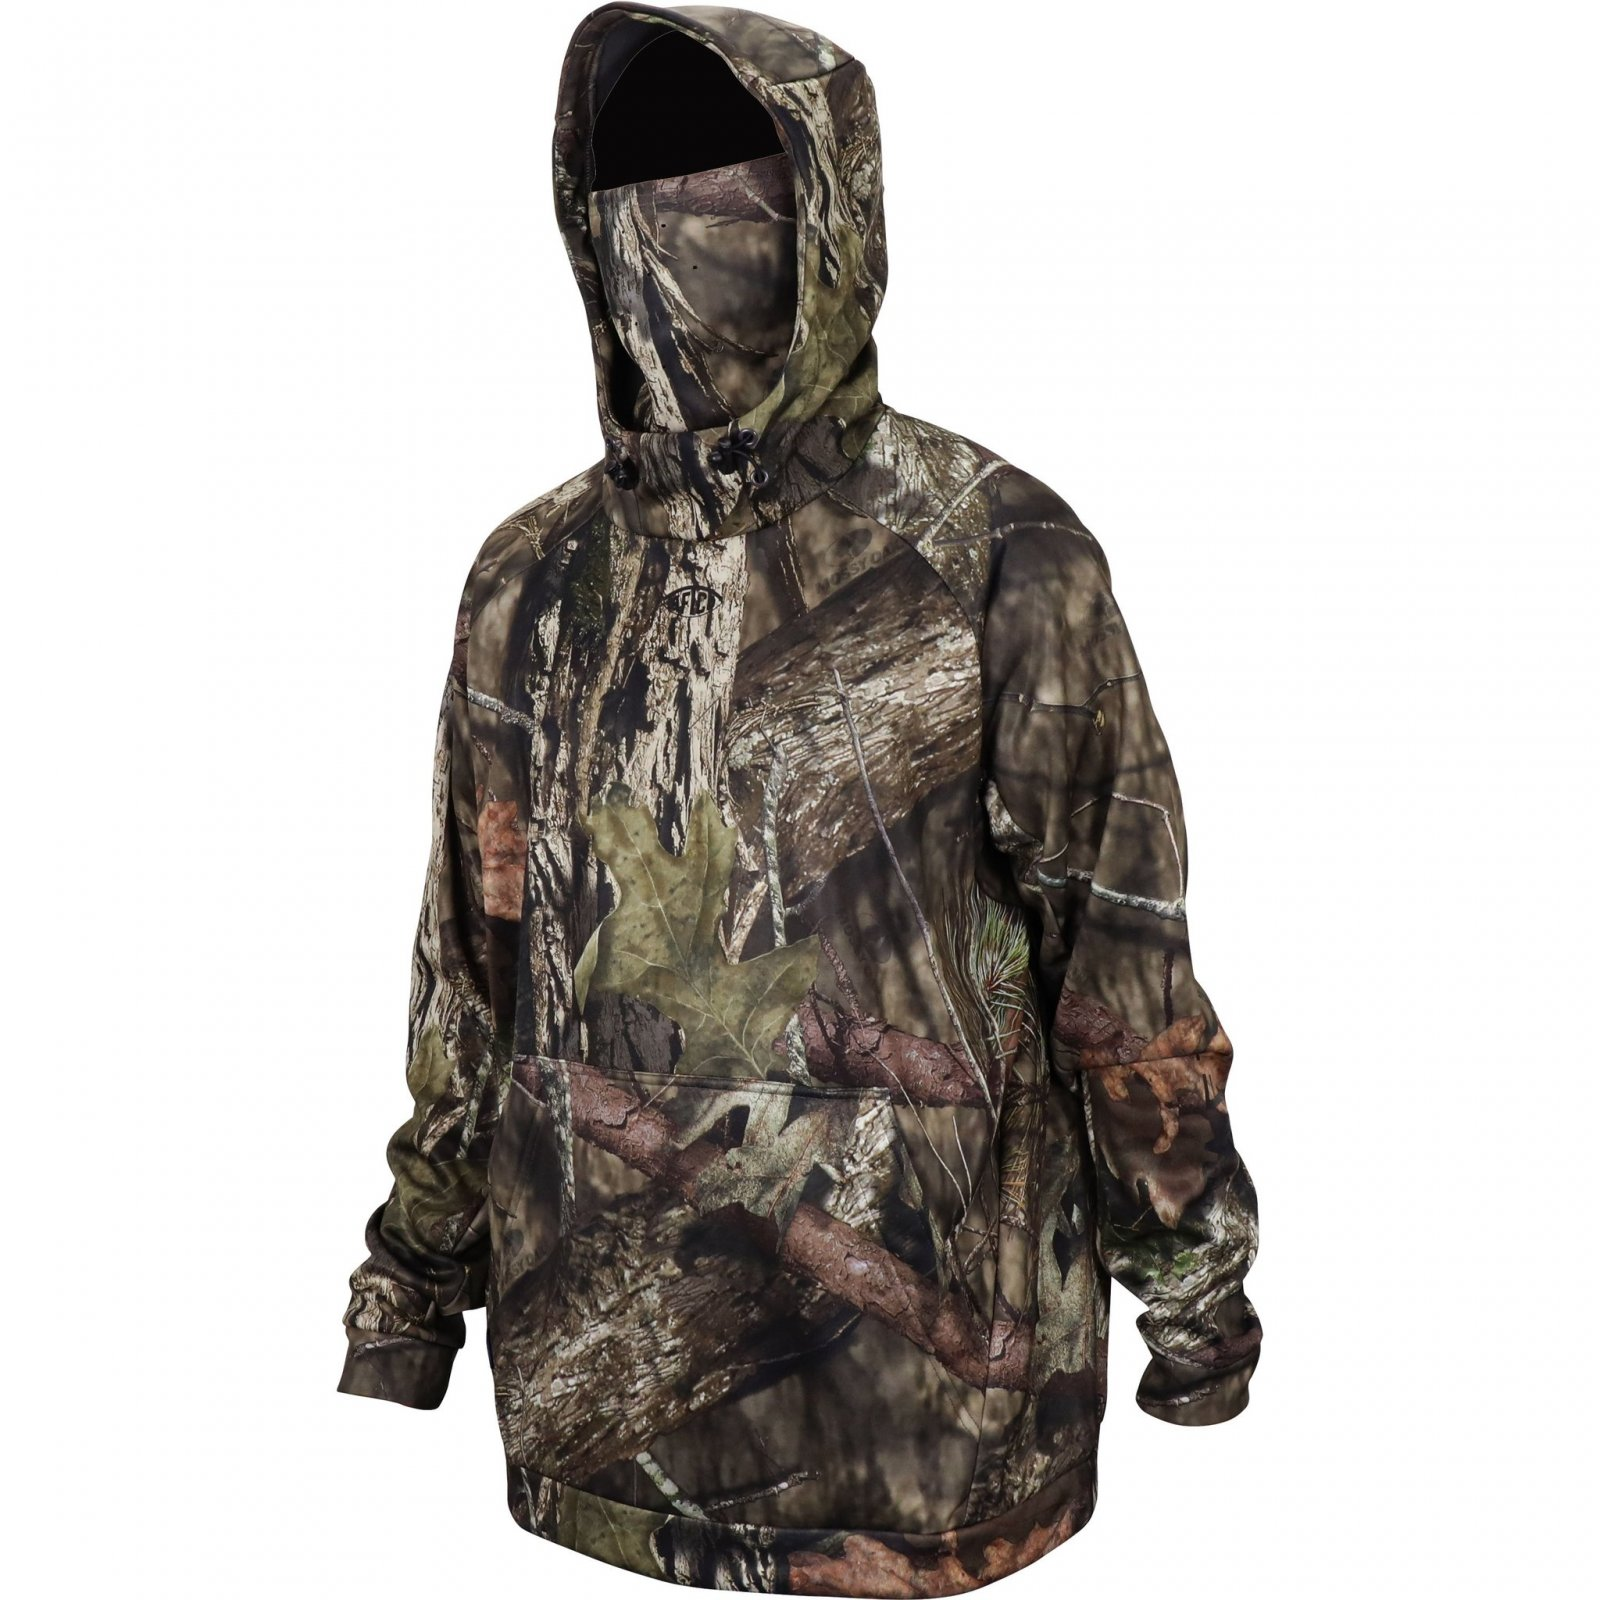 Aftco Reaper Mossy Oak Camo Sweatshirt